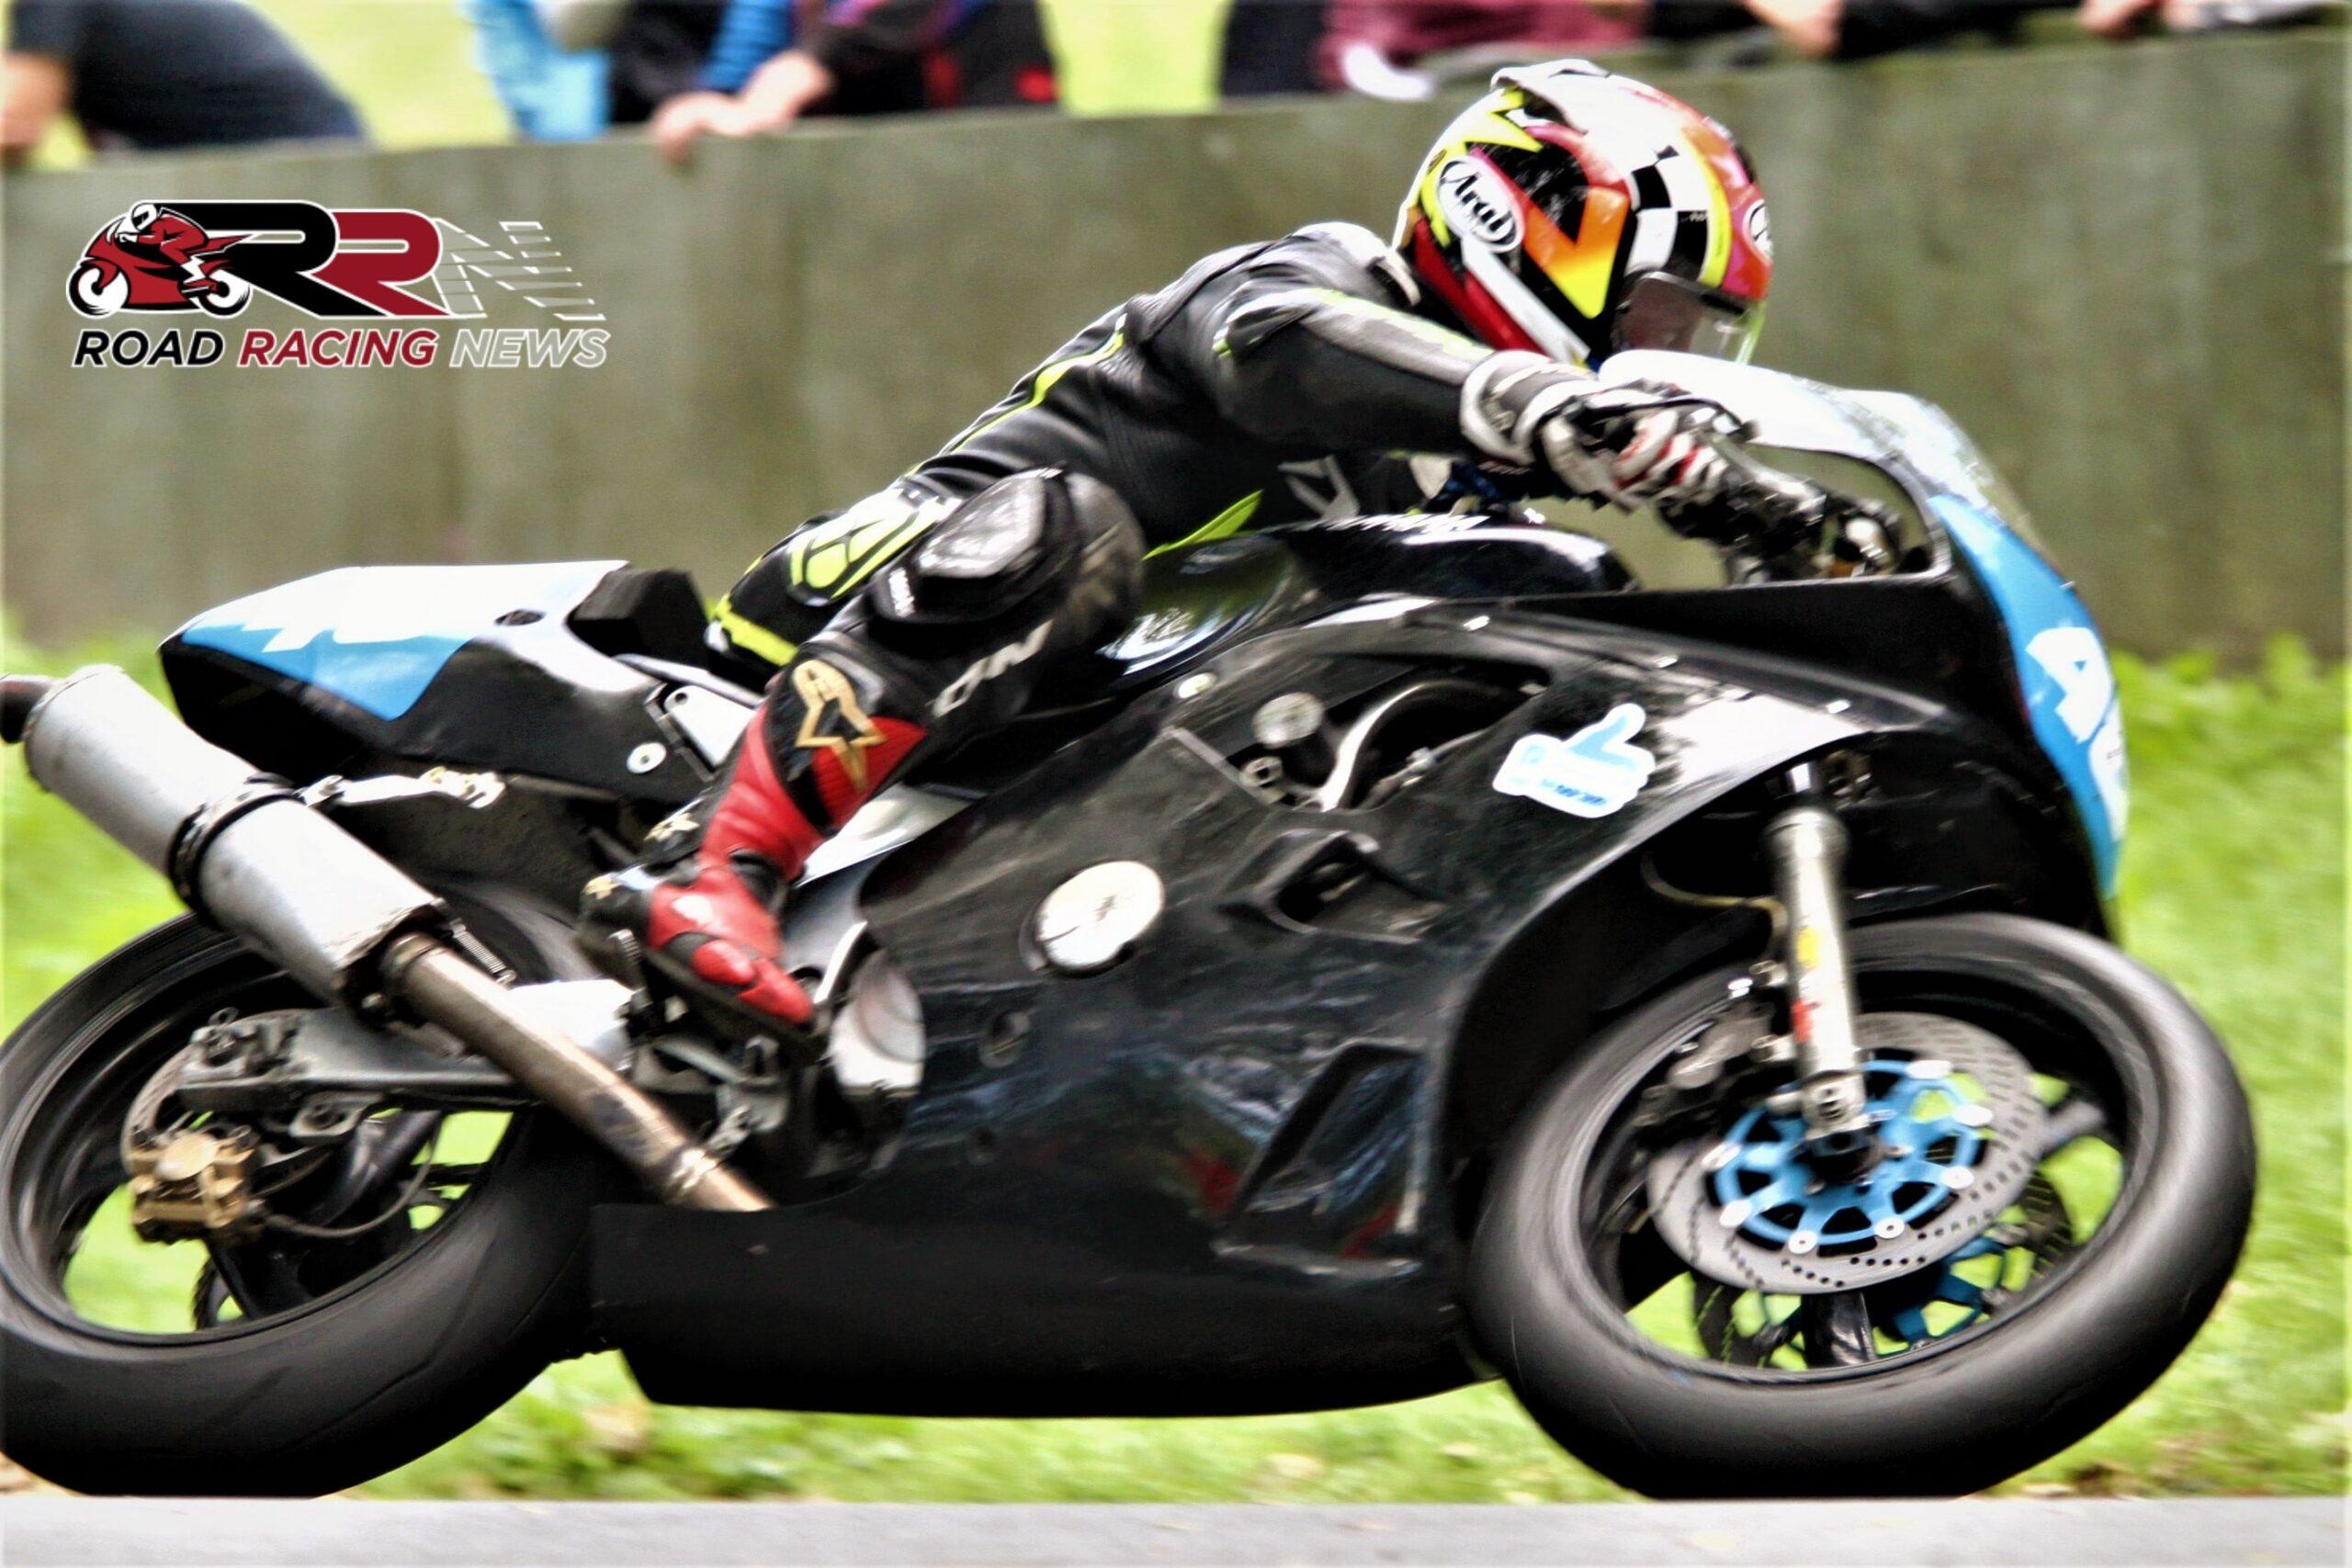 Road Racer's Adventures: BMCRC MRO Championships, Oulton Park